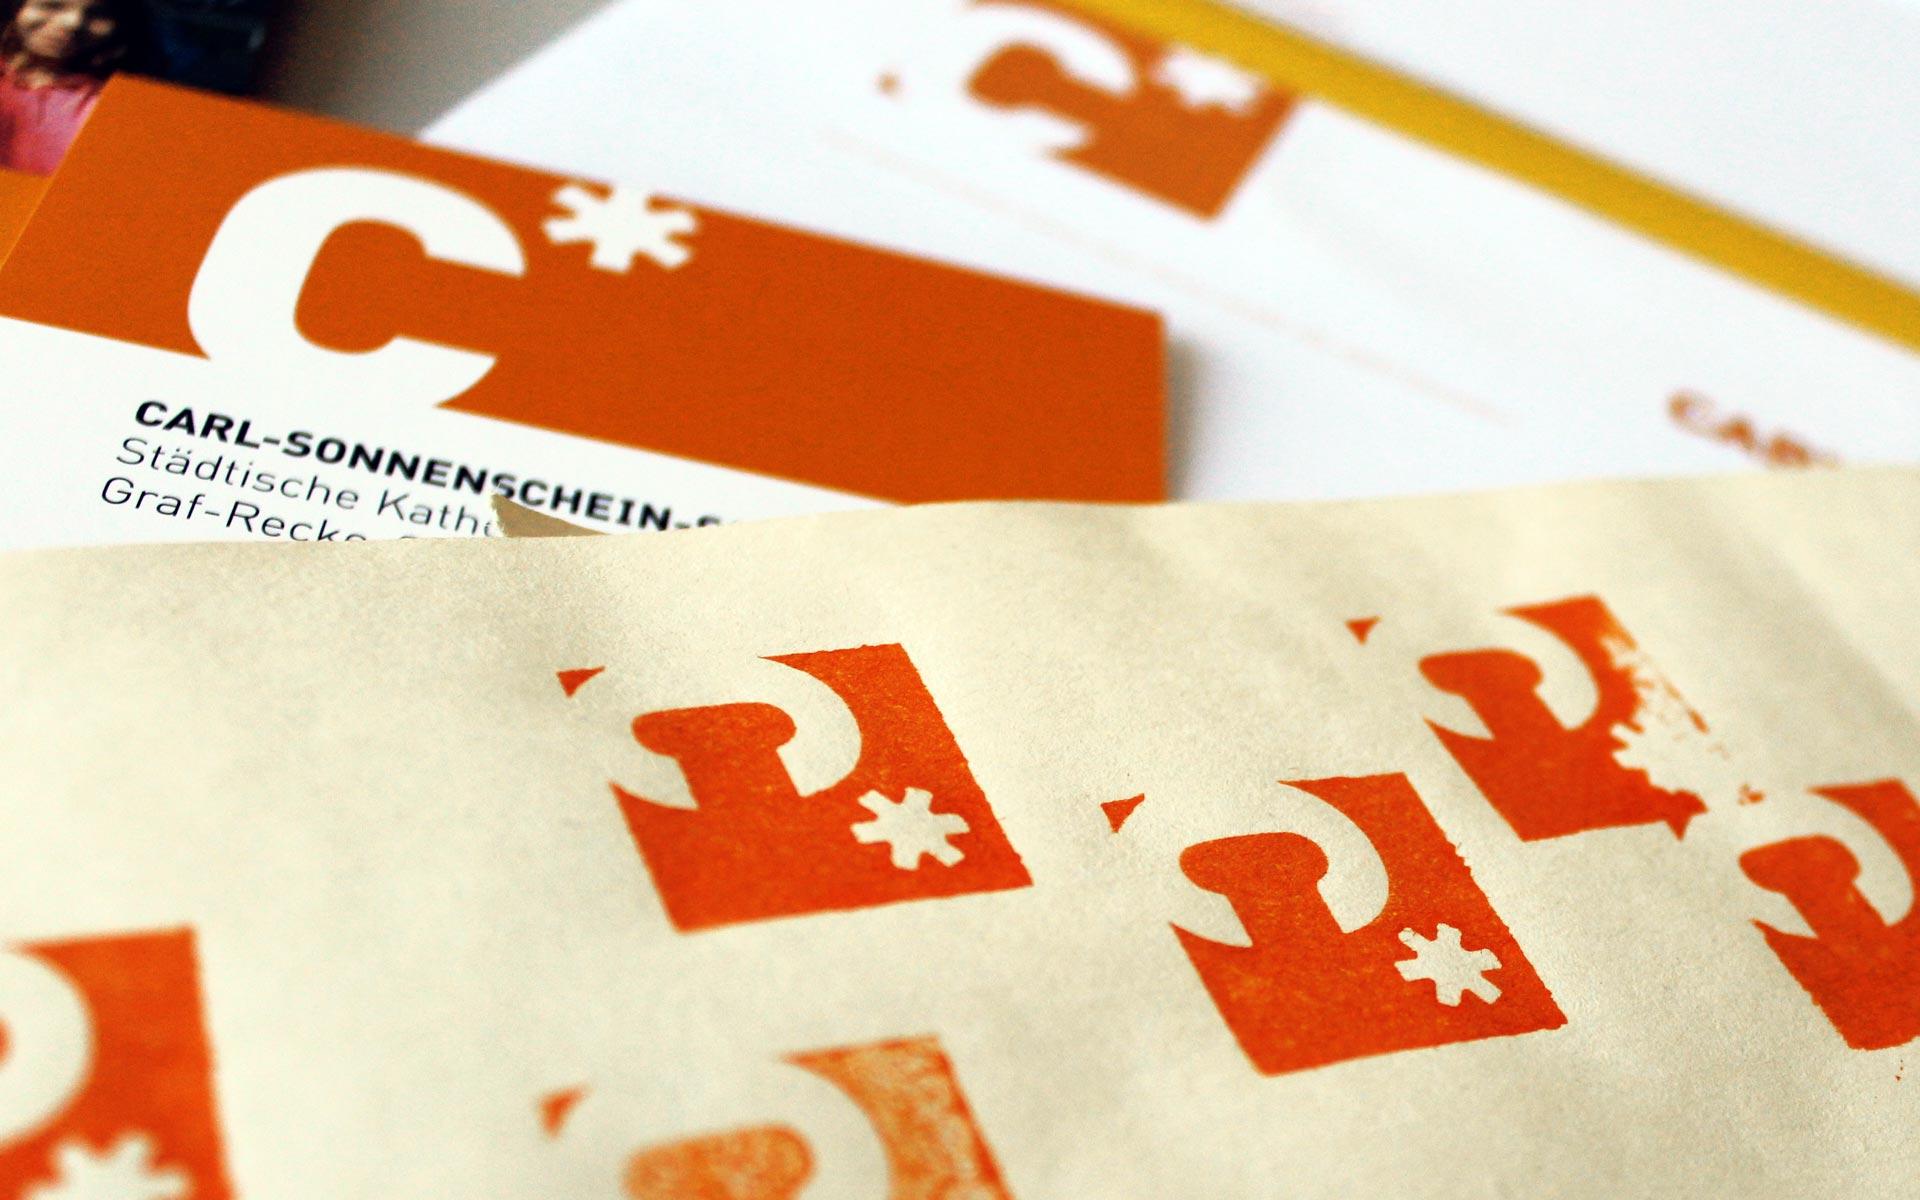 Carl Sonnenschein Schule Corporate Design, Stempel, Logotype